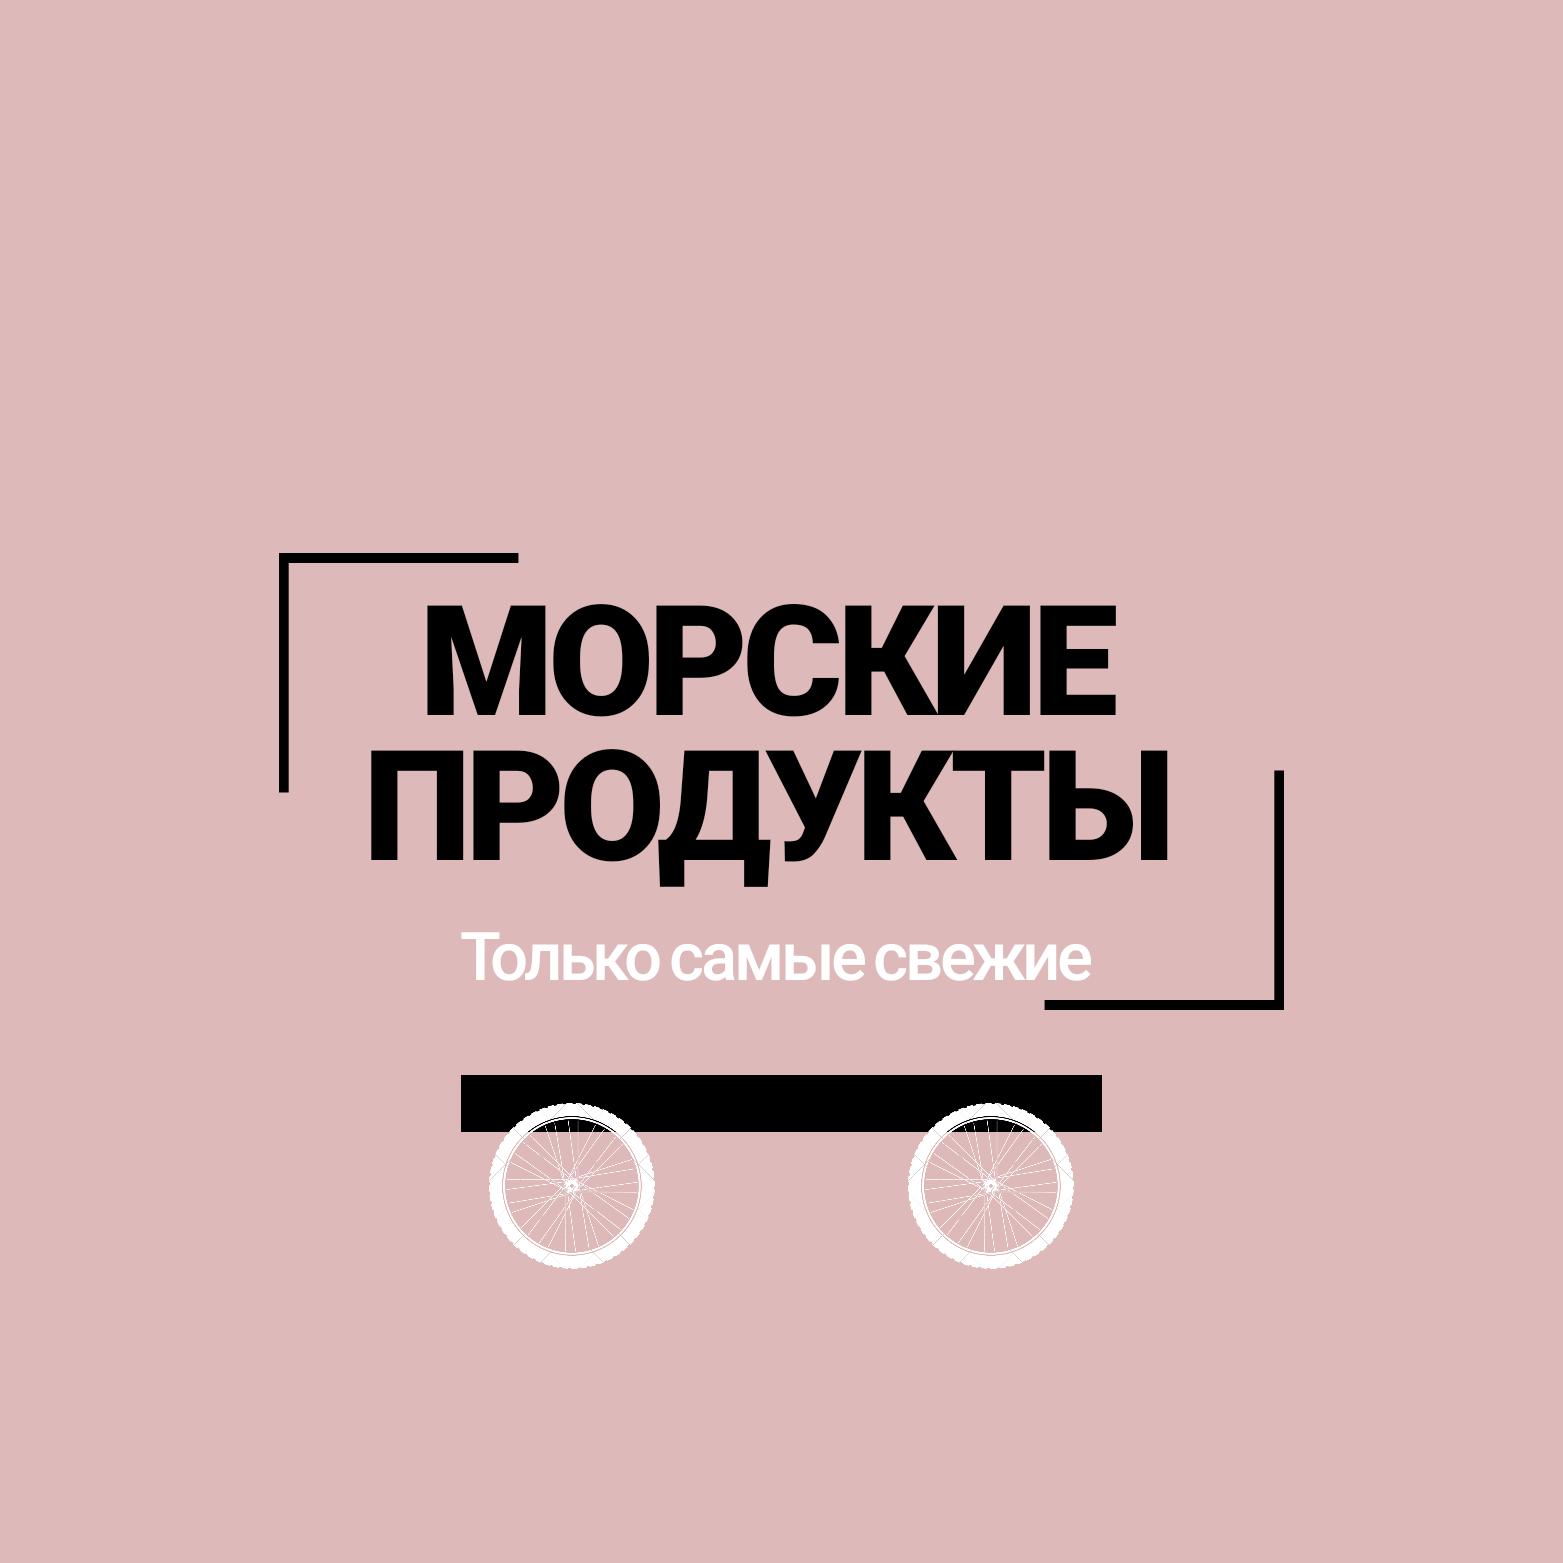 Разработать логотип.  фото f_7735ec659c8197a2.png